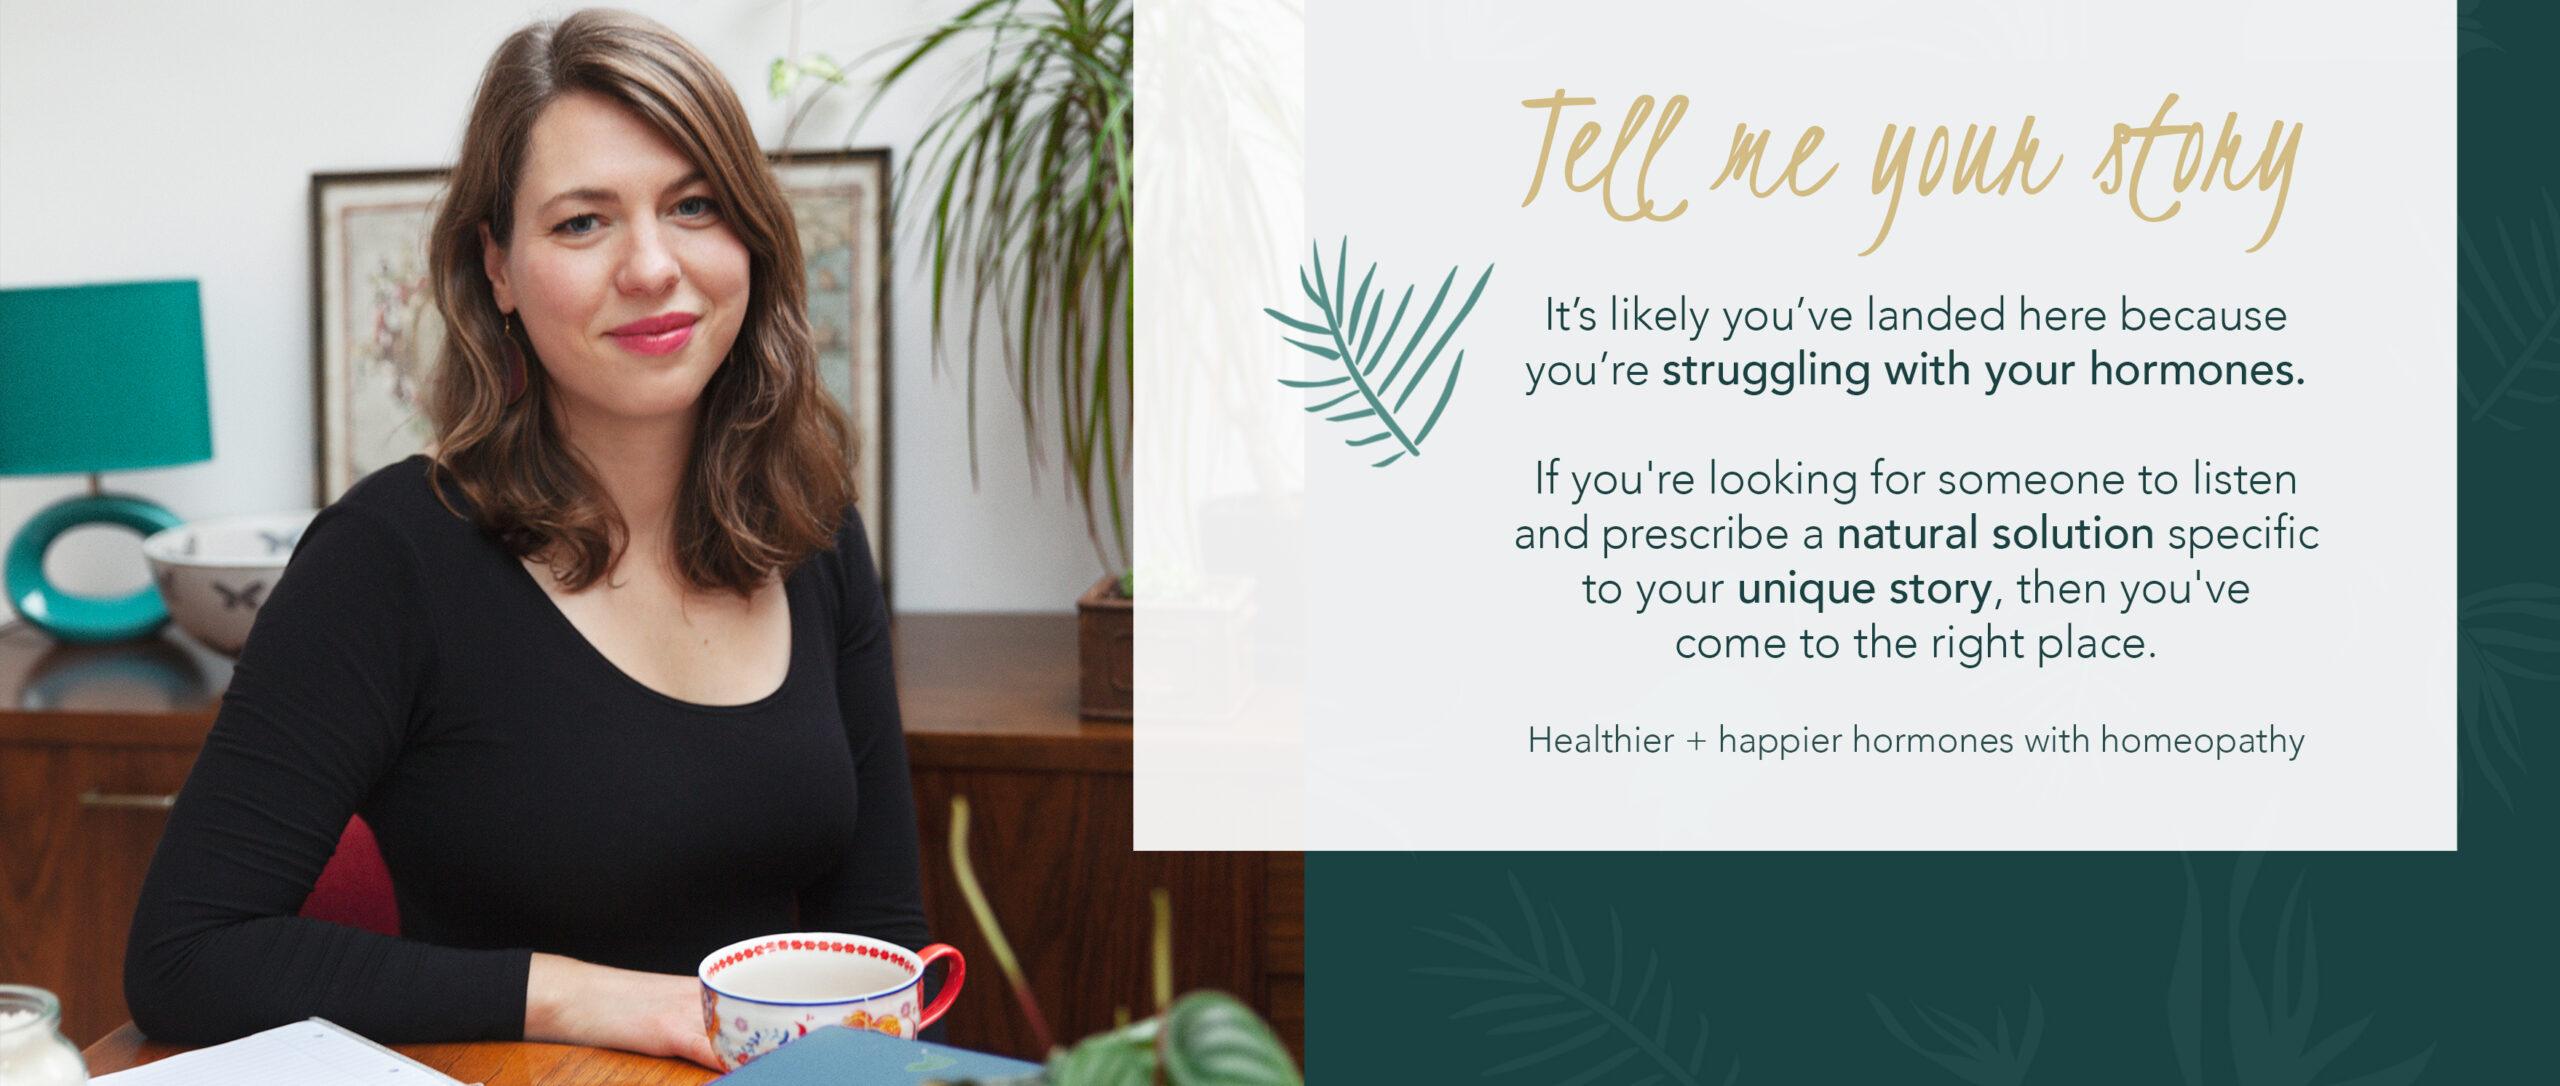 Hormones - happier & healthier with homeopathy   London   Skype